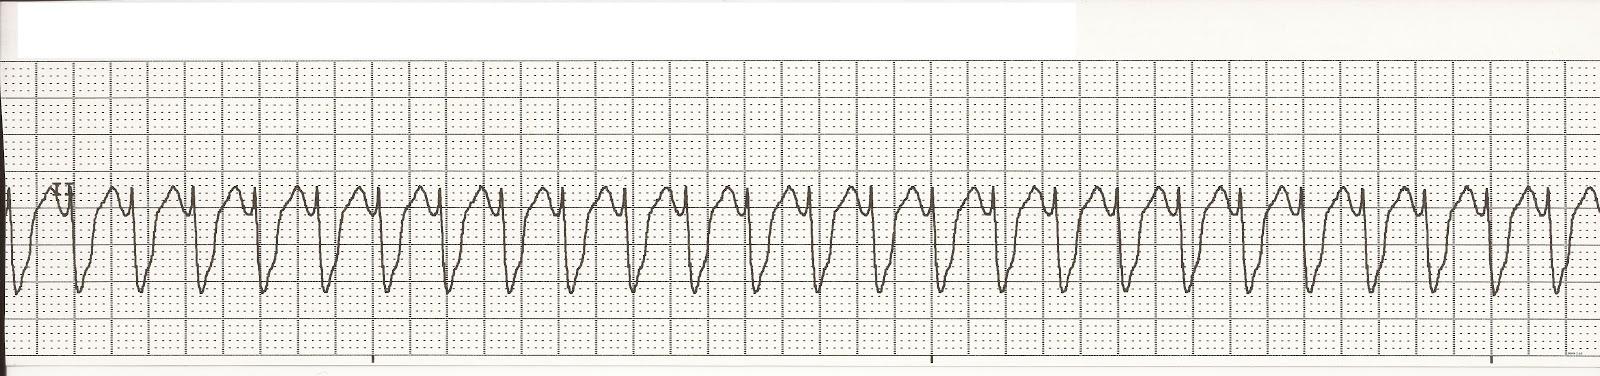 Float Nurse: October 2012 Ventricular Tachycardia Rhythm Strip